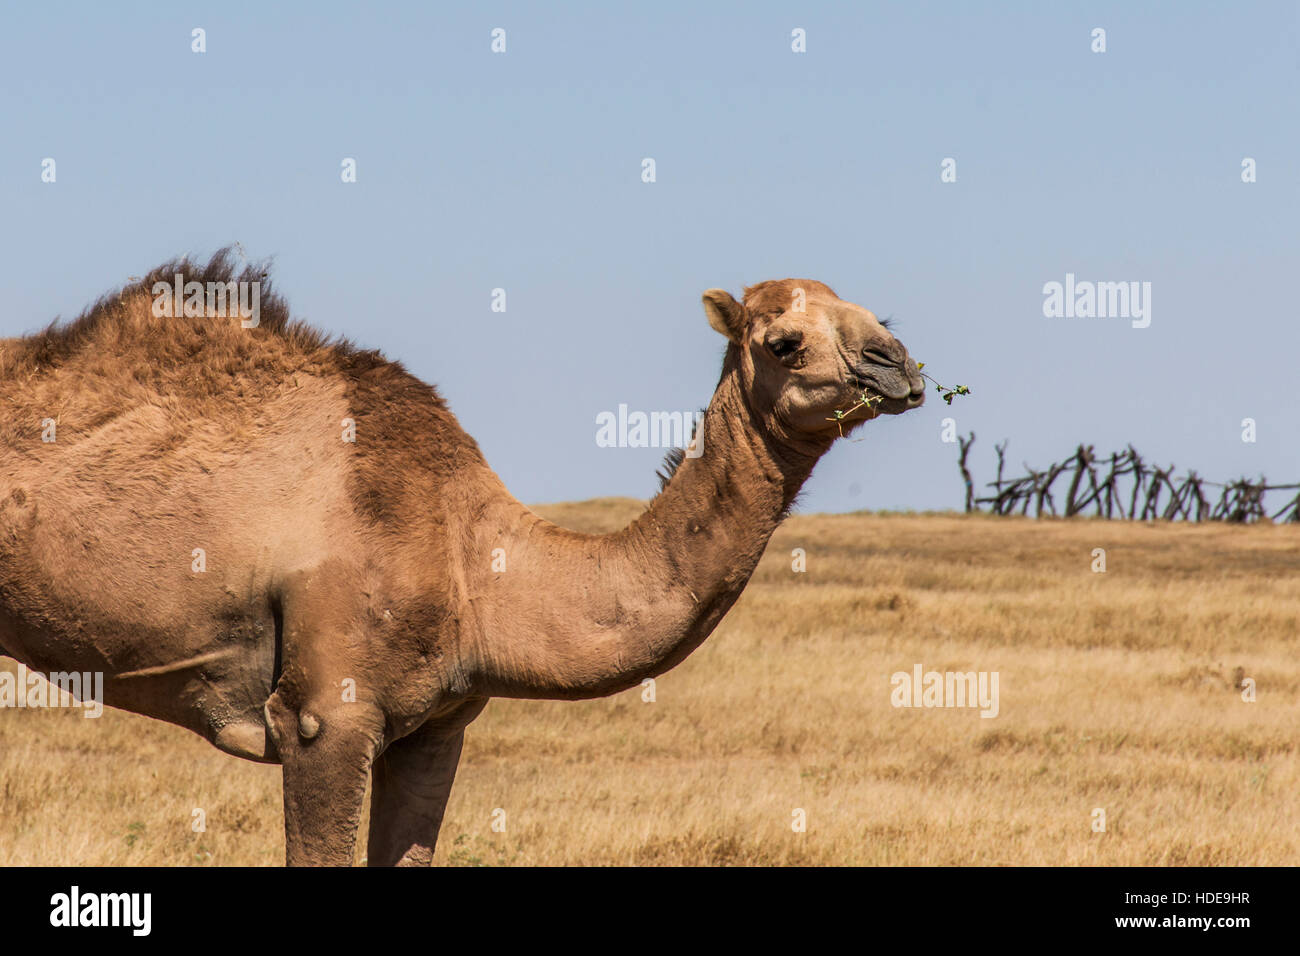 wildlife Camel looking inside Camera in Oman salalah landscape Arabic 2 - Stock Image